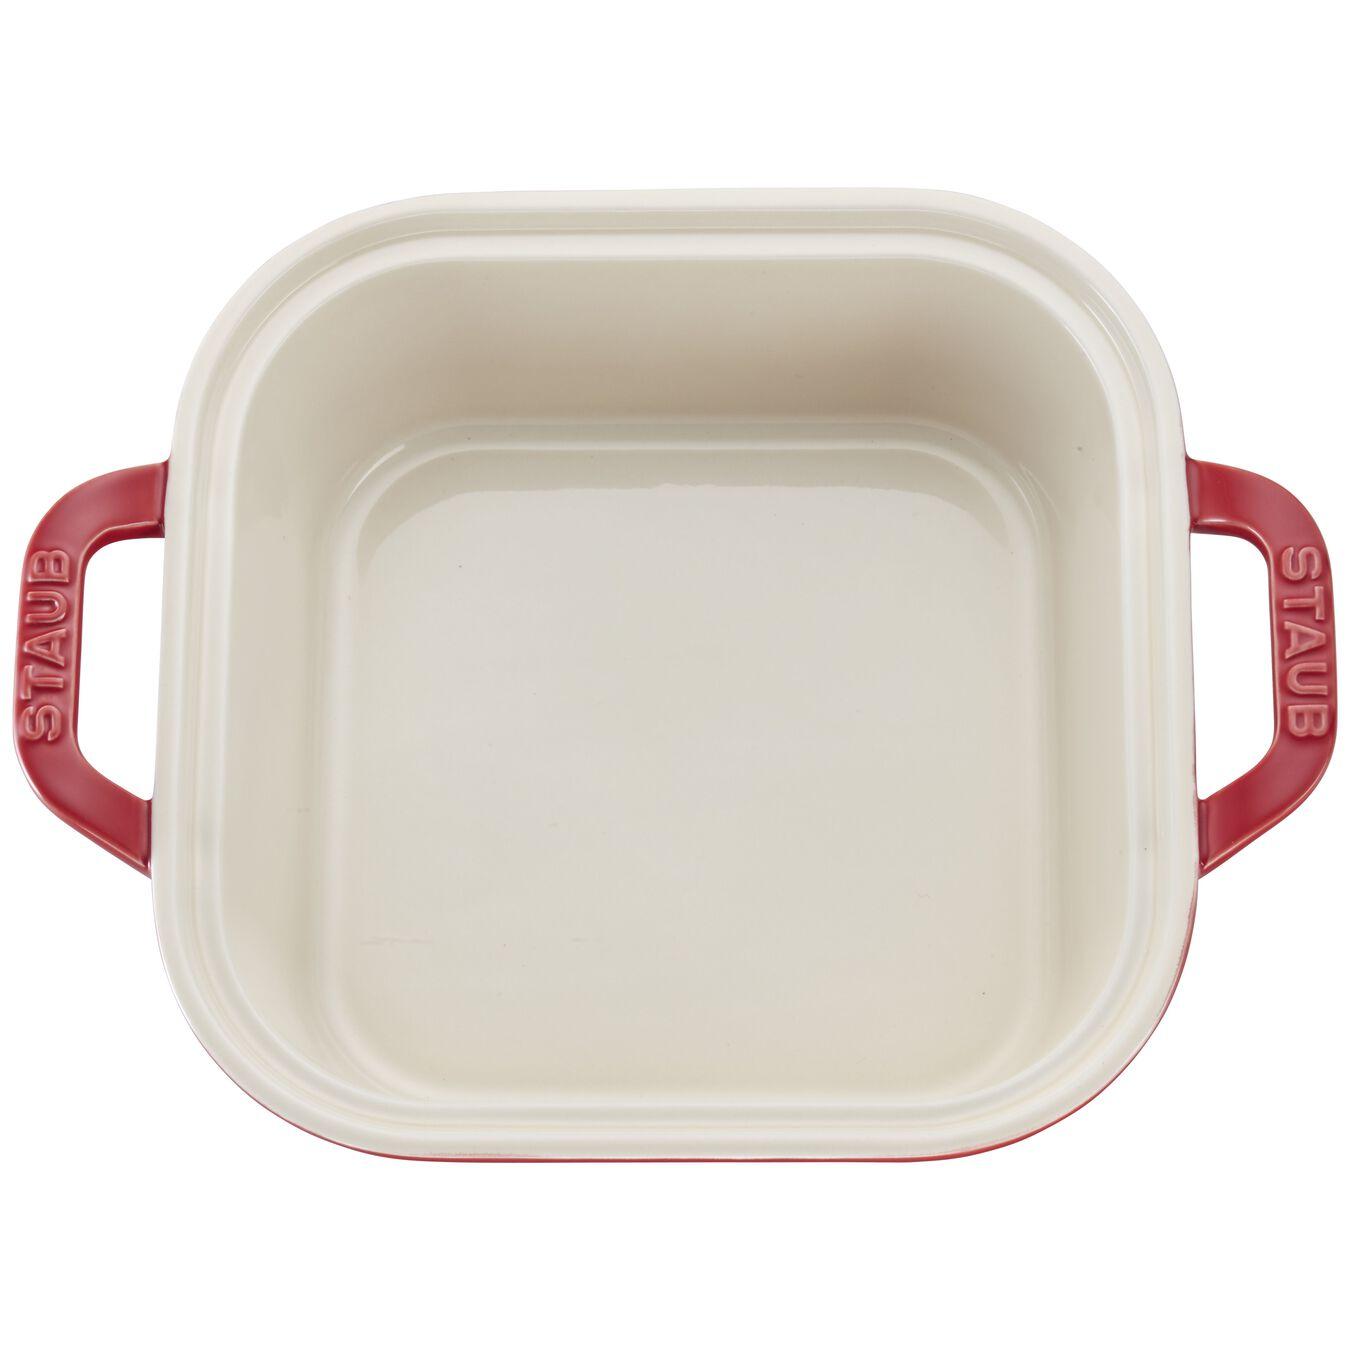 4-pc Baking Dish Set - Cherry,,large 6